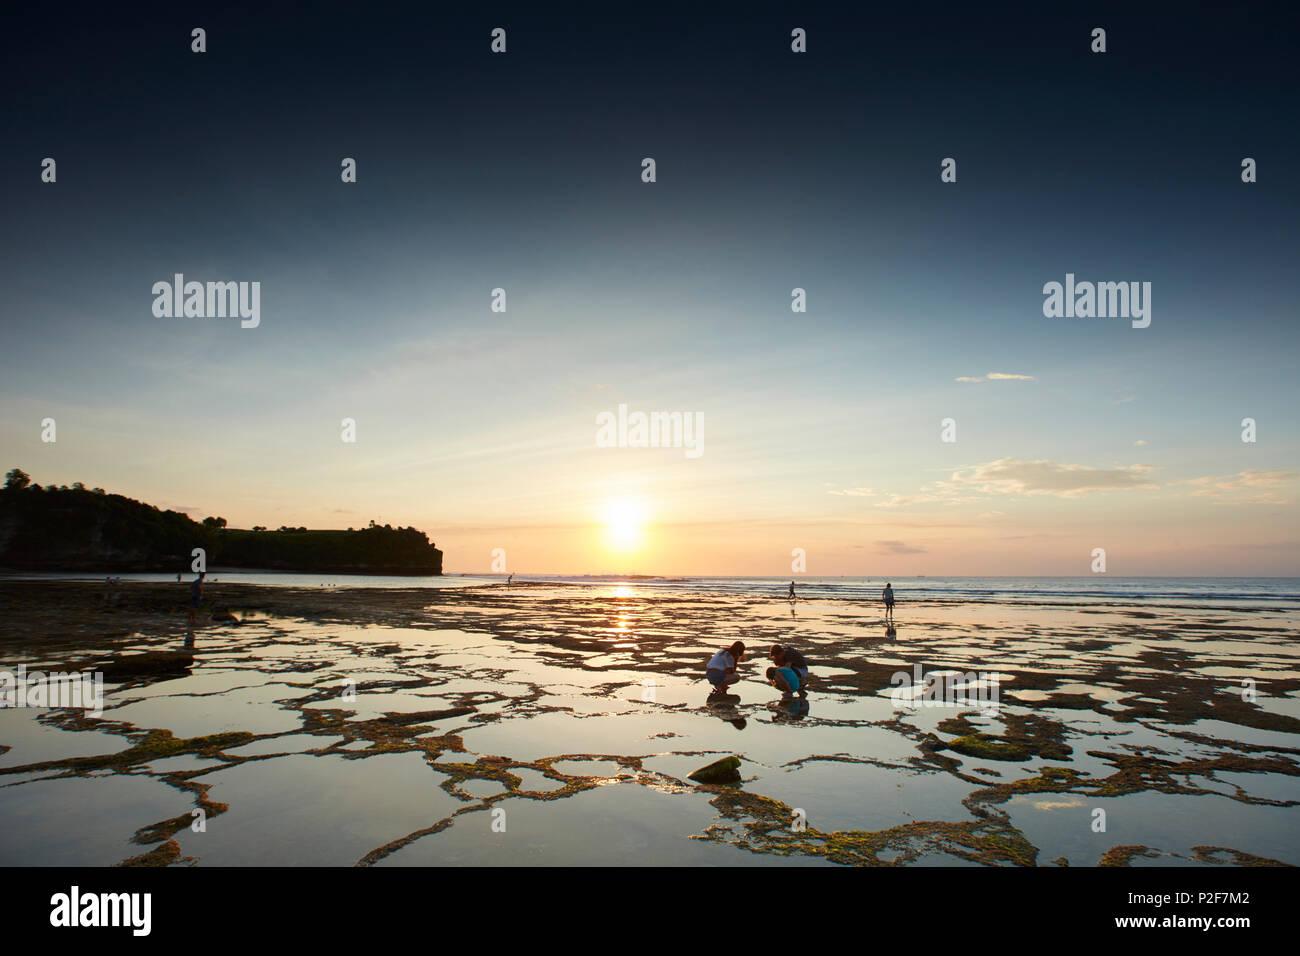 Playa en marea baja, Balangan, Bali, Indonesia Imagen De Stock